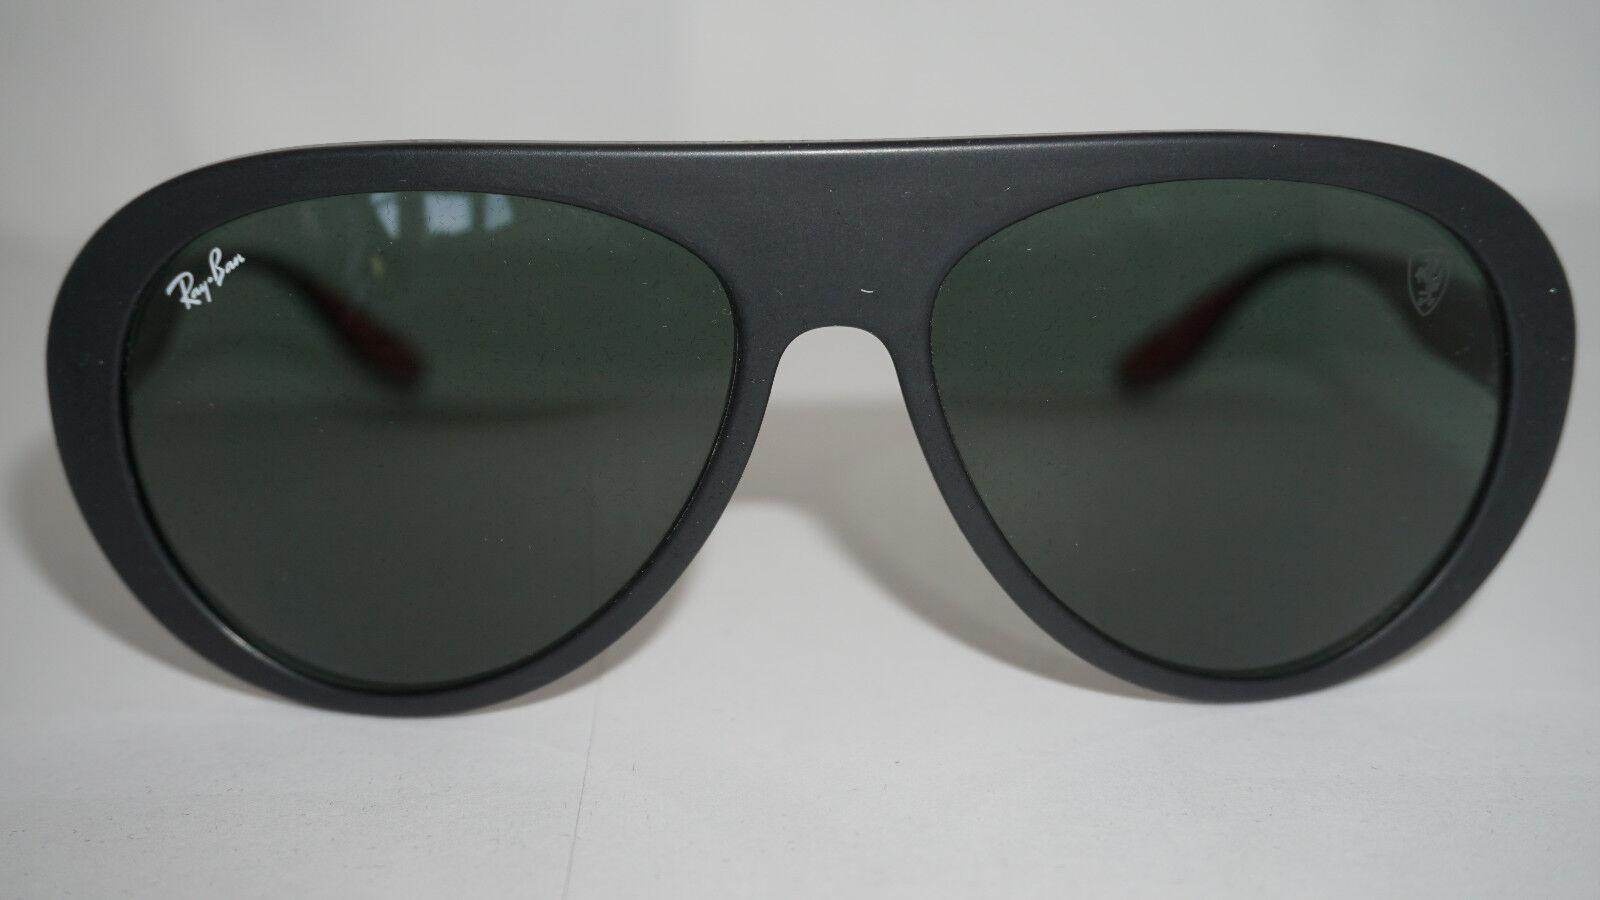 dd9a9ff6606 Ray Ban Sunglasses Ferrari Black Green Classic Rb4310m F60271 59 140 ...